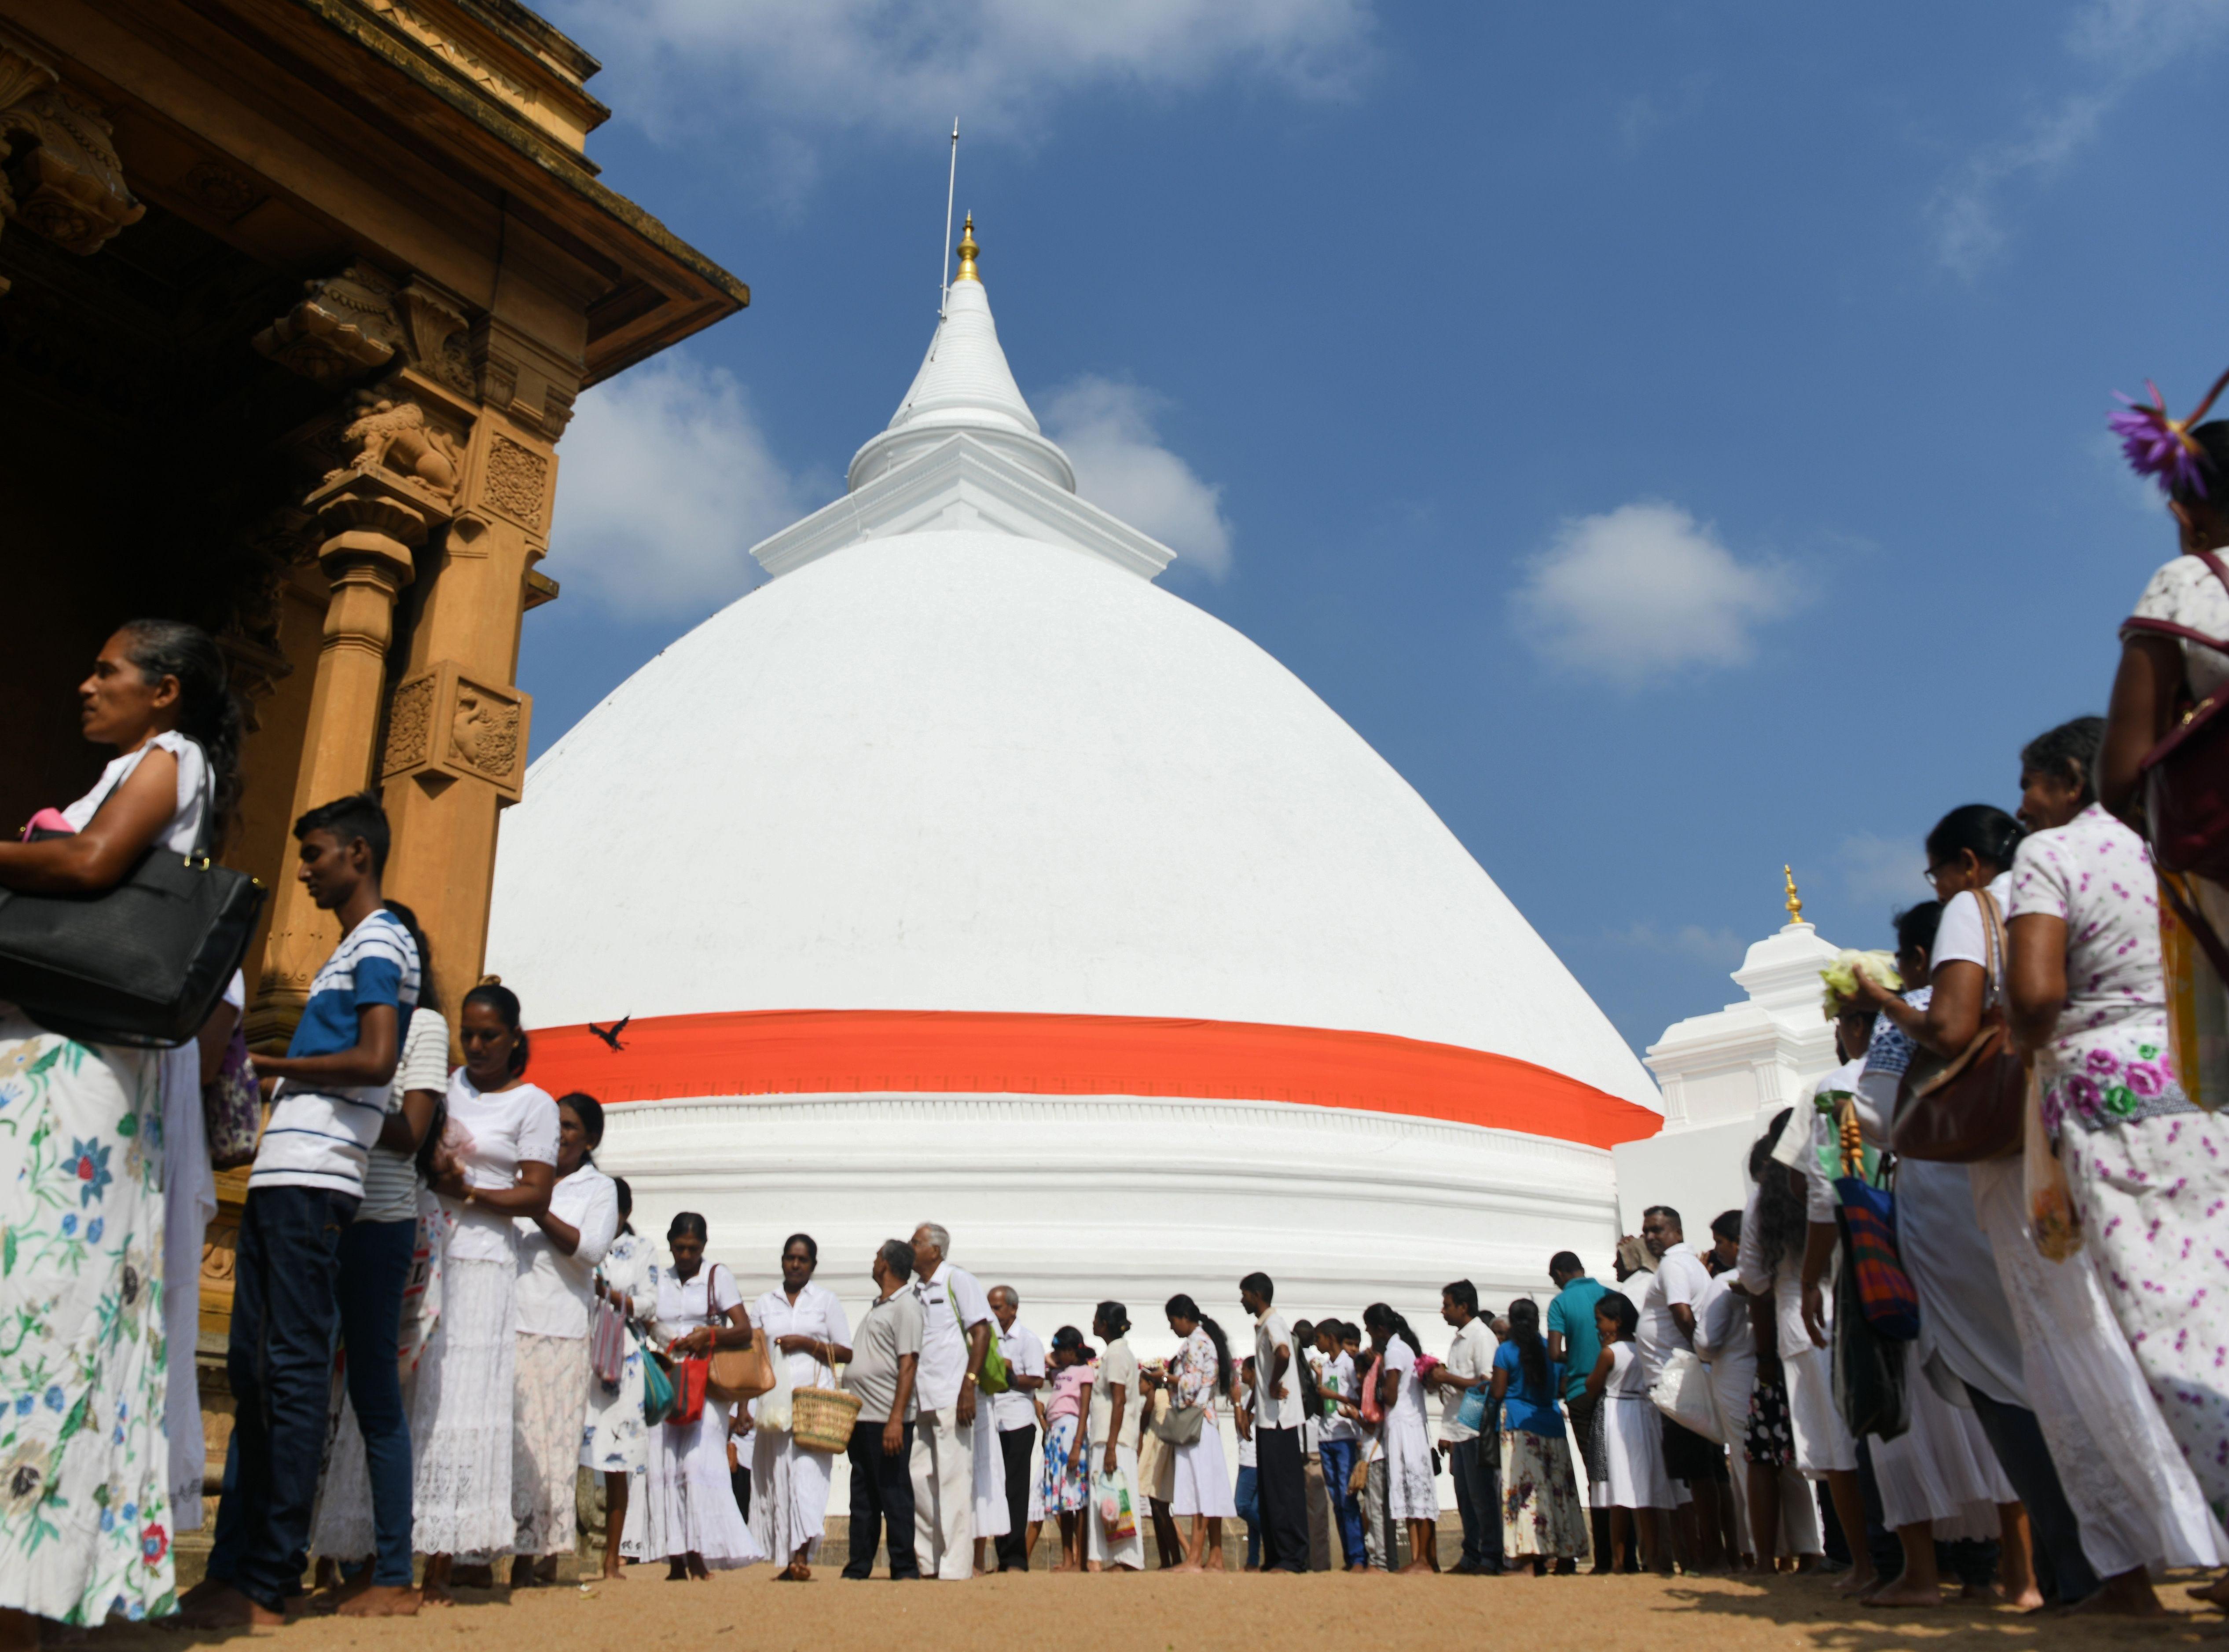 Sri Lankan Buddhist devotees line up to offer prayers to mark the new year at Kelaniya Raja Maha Vihara Buddhist temple in Colombo on Jan. 1, 2019.